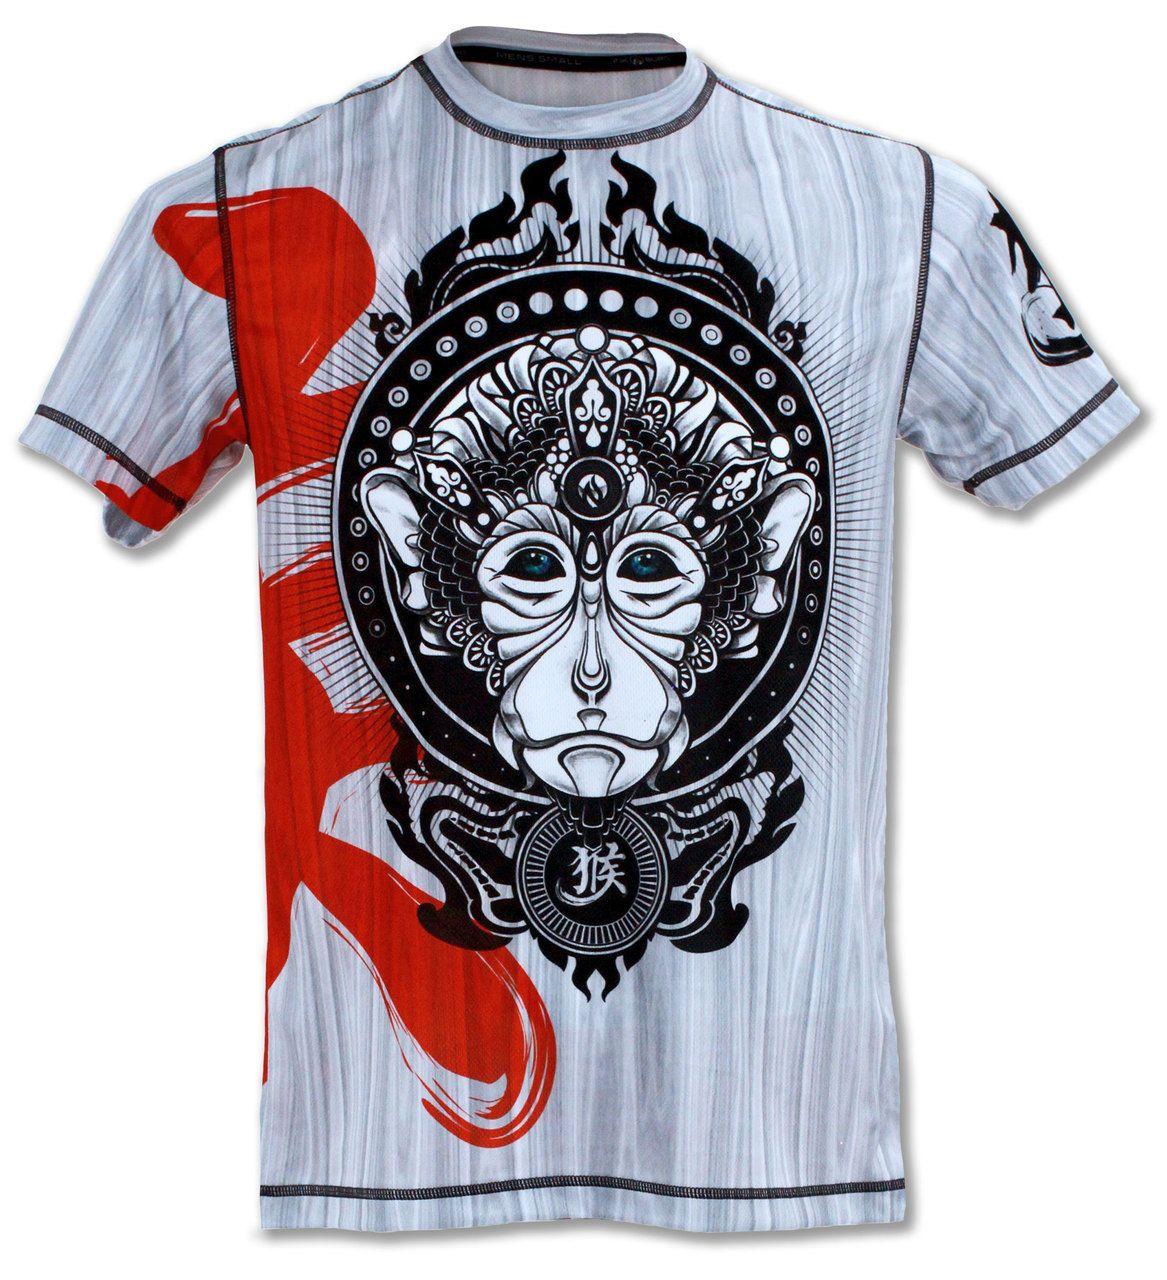 Men S Monkey Tech Shirt Crossfit Clothes Running Shirts Shirts